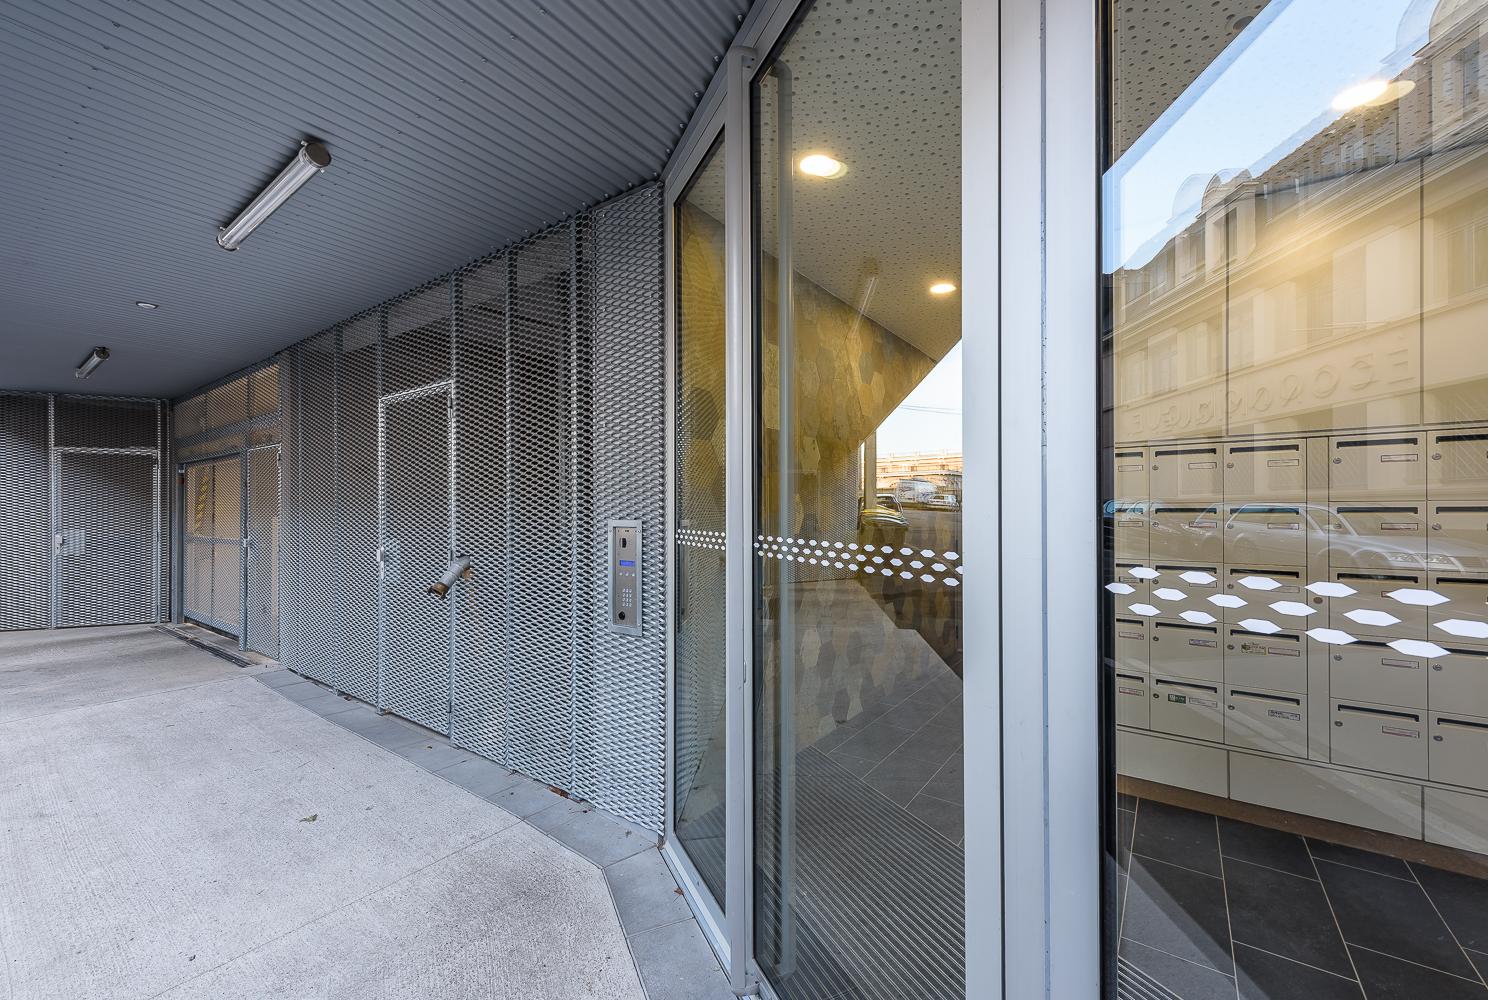 2A Design-PEROBA-lgts-Pixelys-Rennes-70